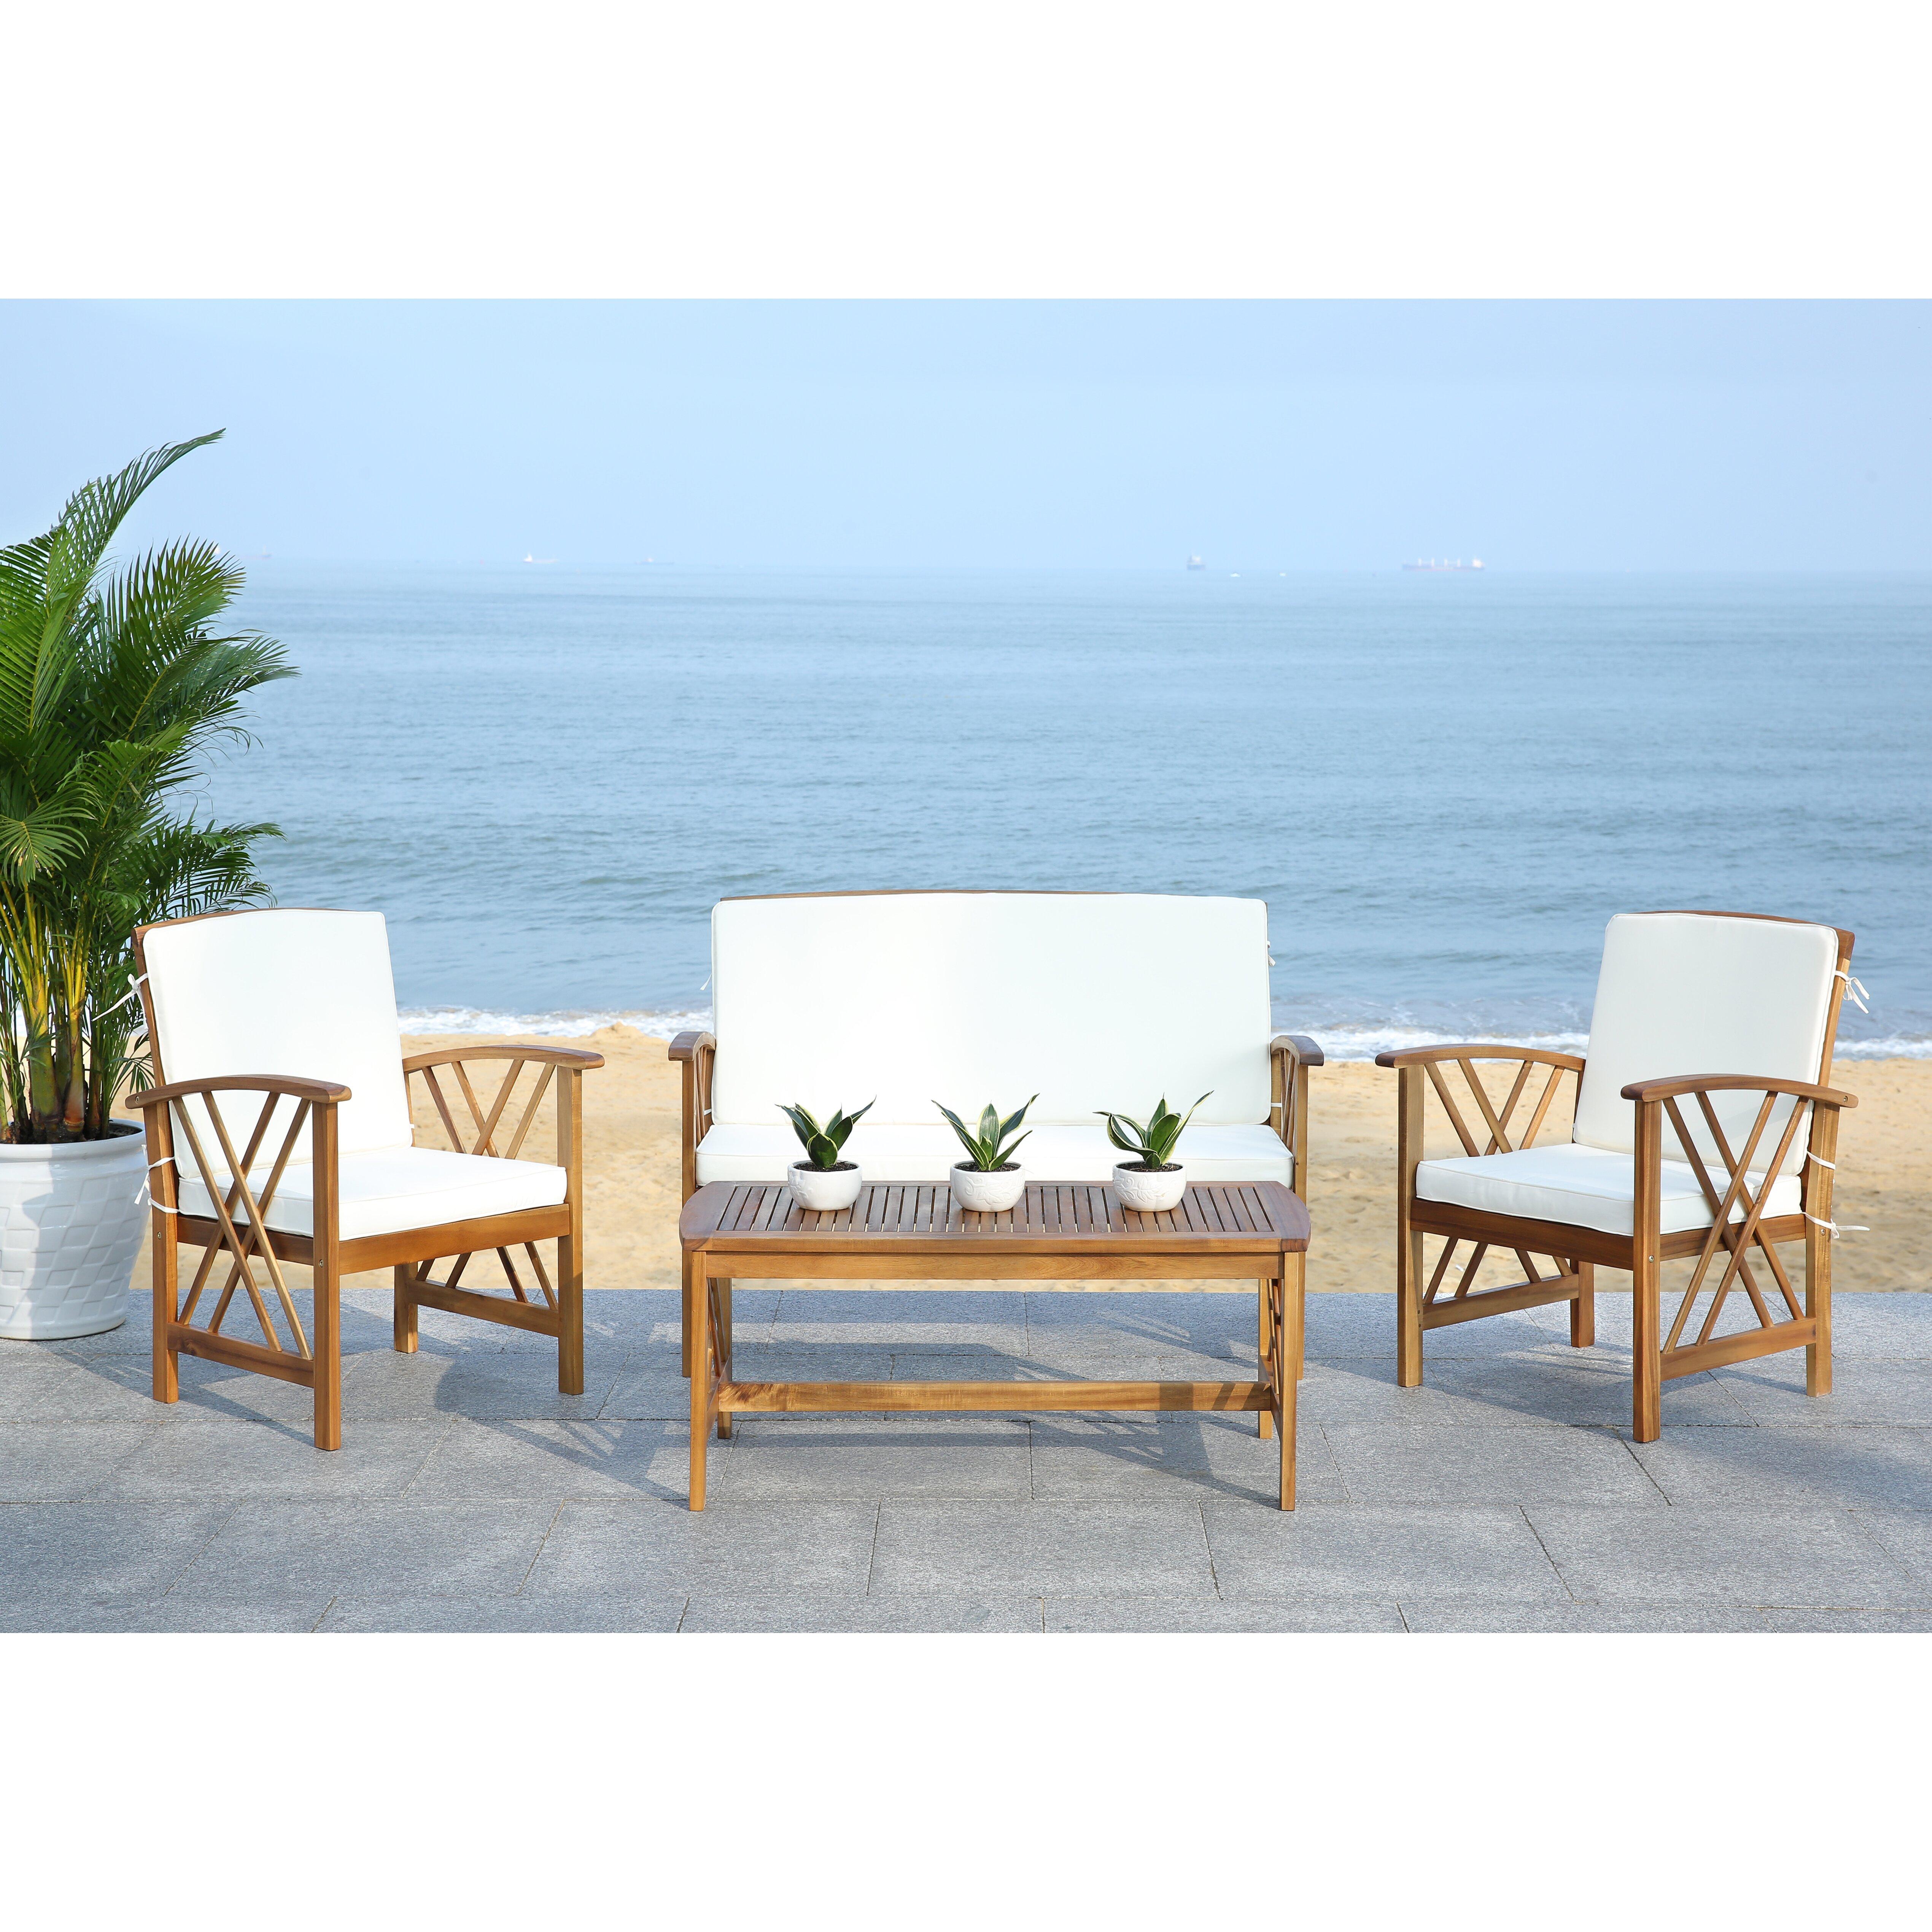 Safavieh Fontana 4 Piece Seating Group with Cushions ... on Safavieh Fontana Patio Set id=77223